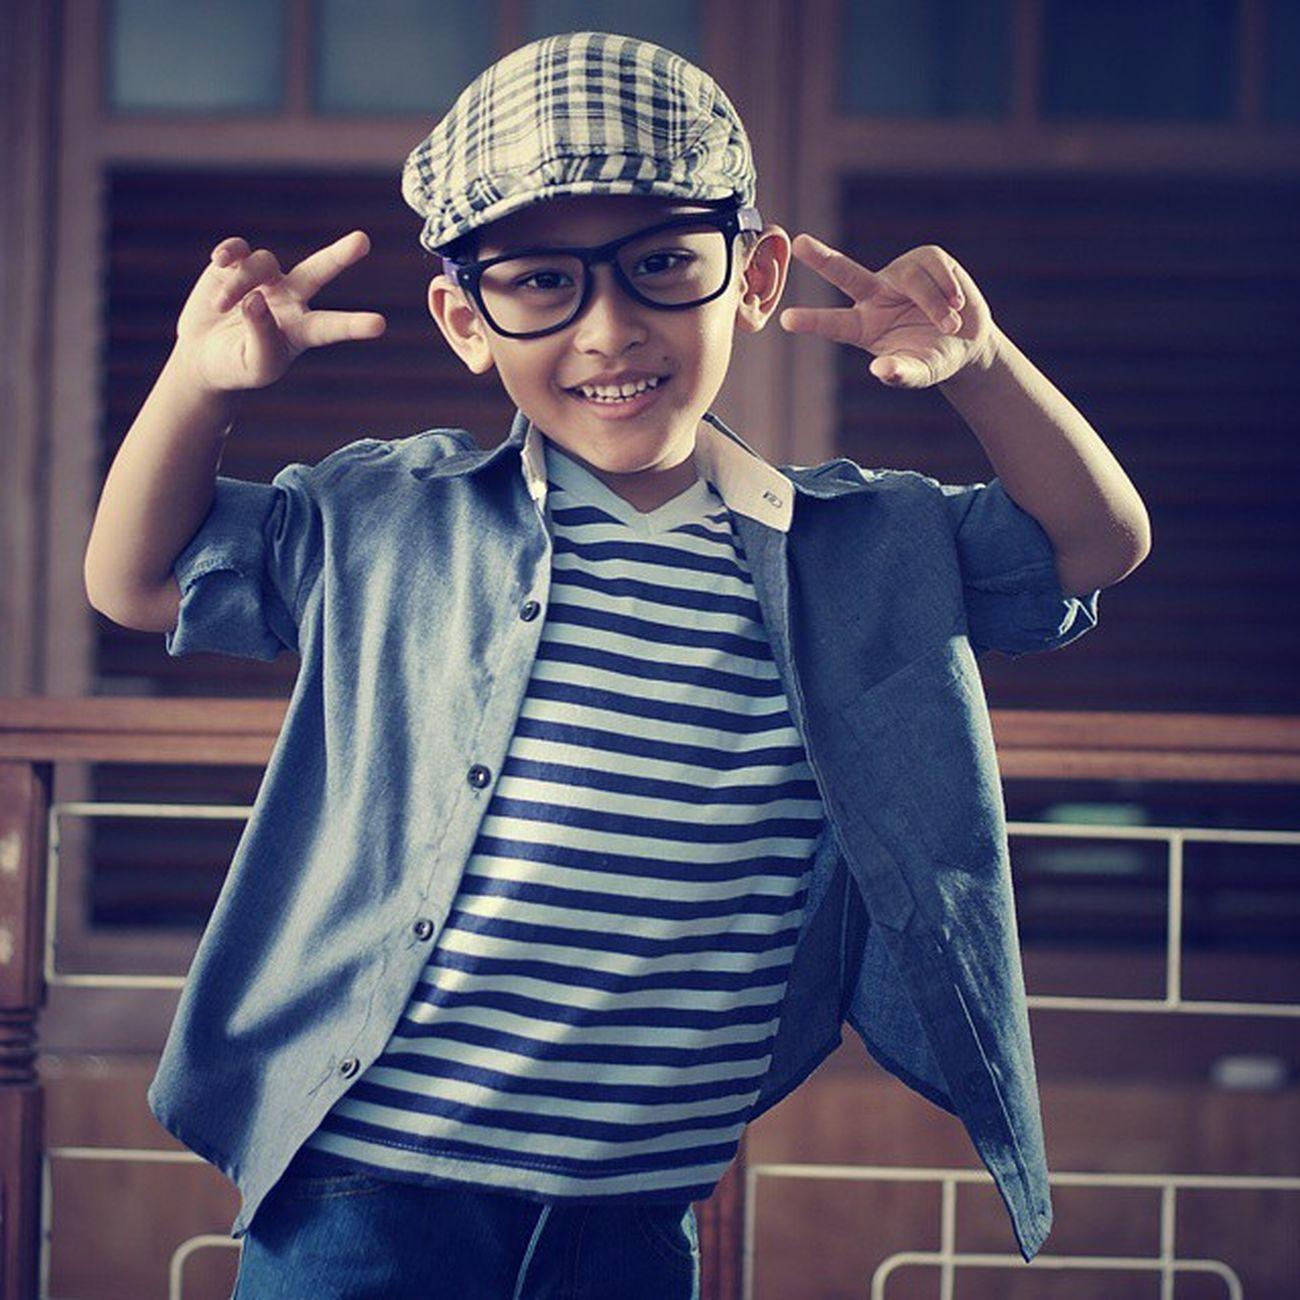 Kids Instakids Instakid Instakidsfashion boy insta_kaskus aic instasunda iphonesia kidsphotography